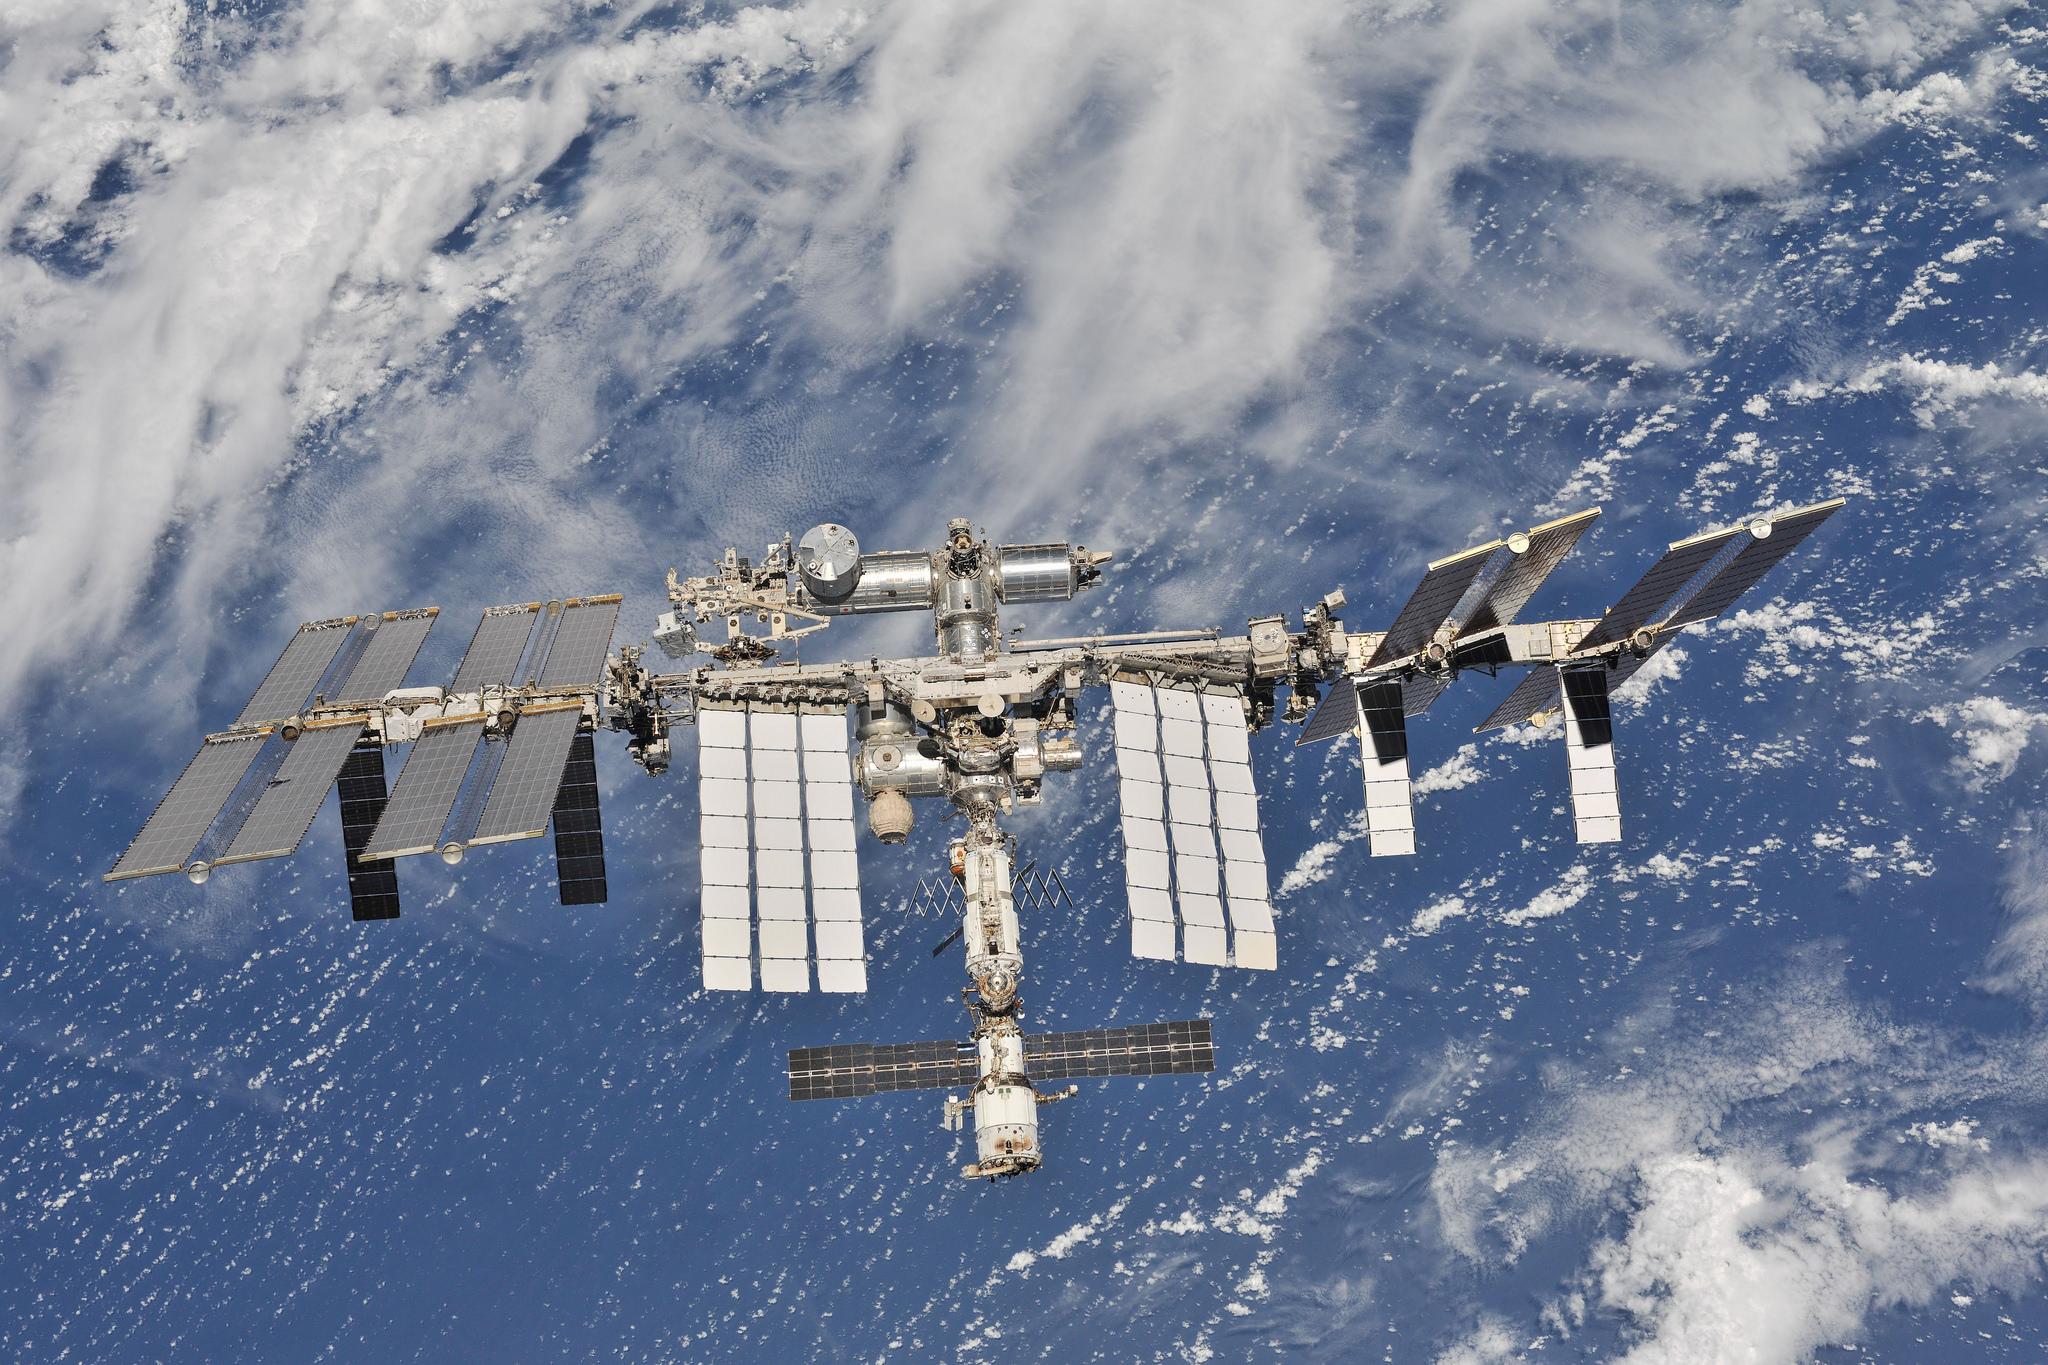 International Space Station photos